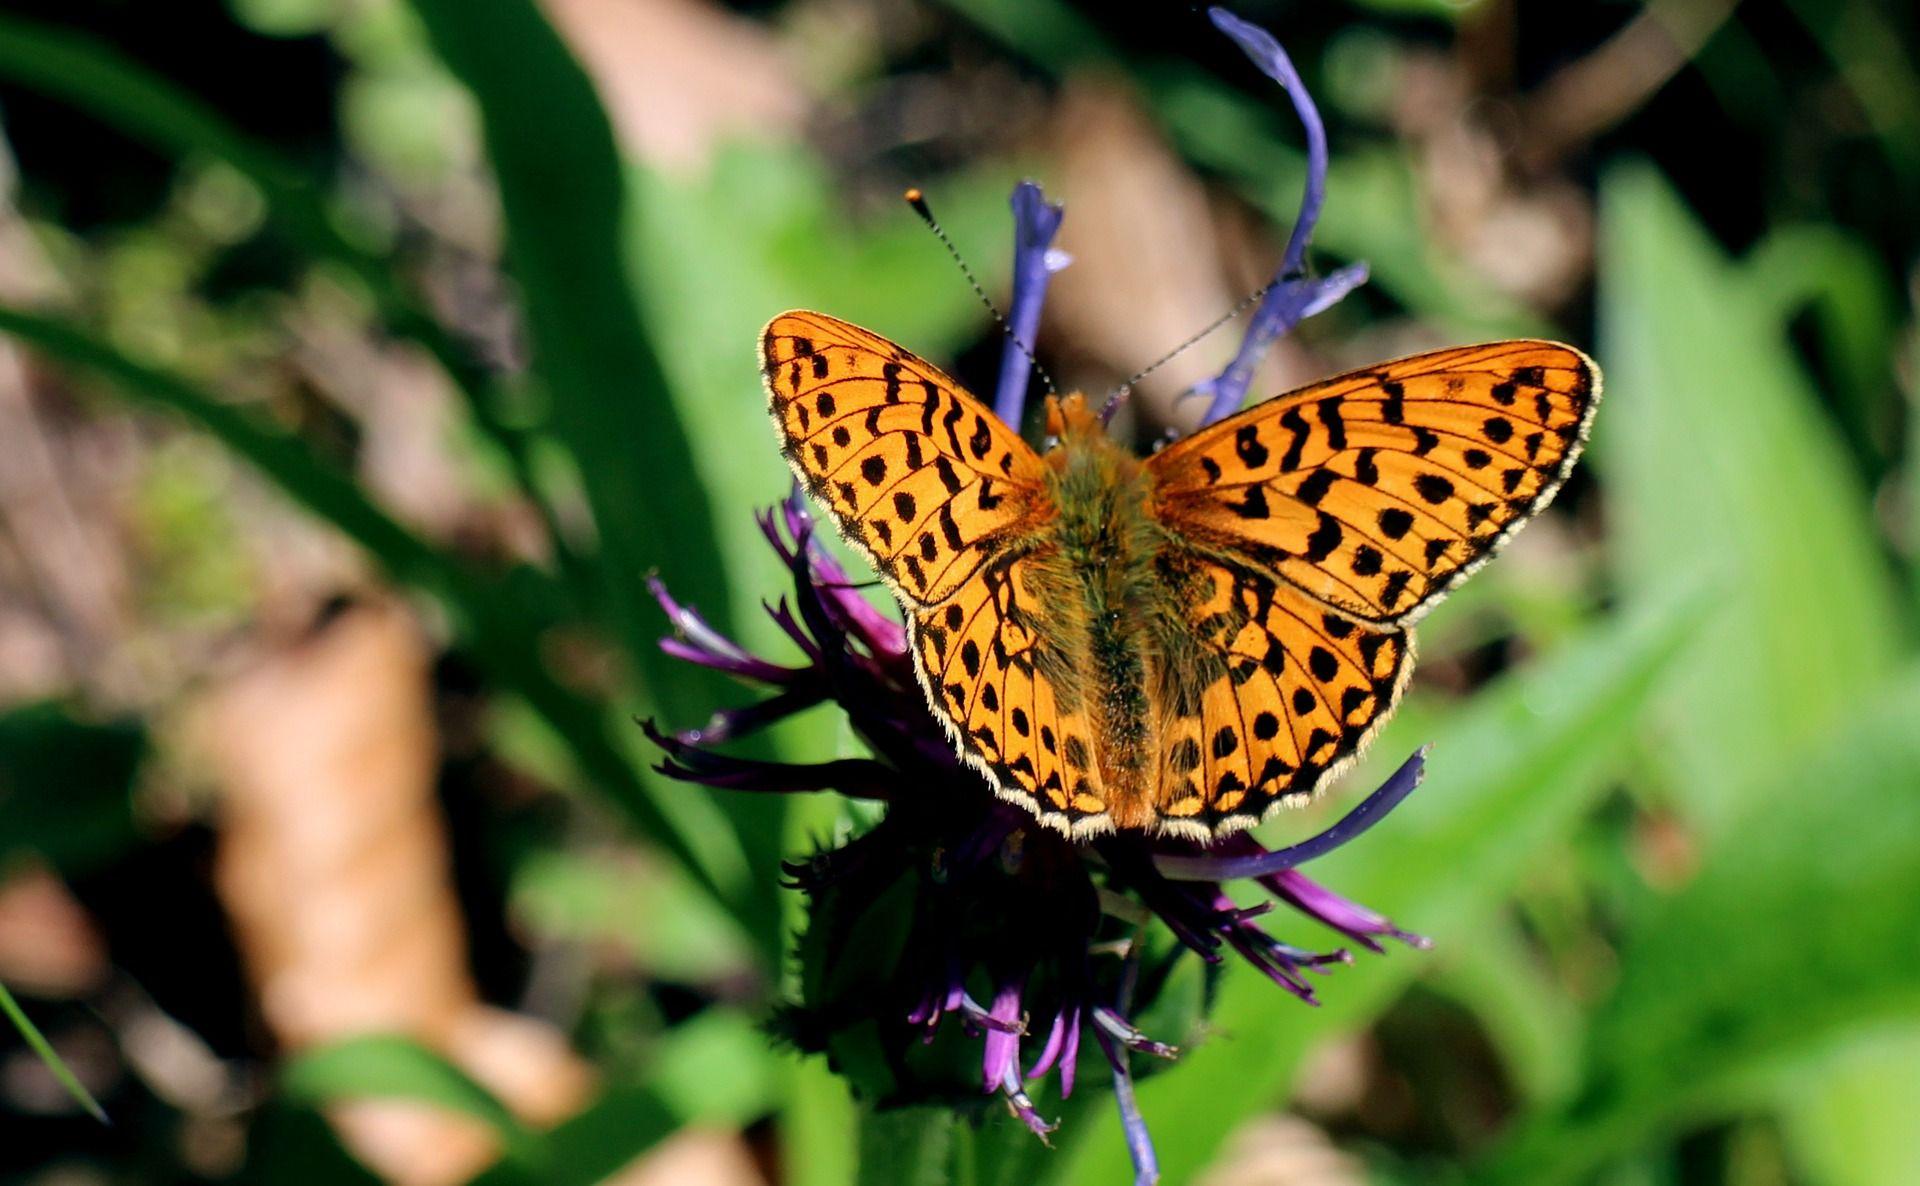 wetlands-mother-of-pearl-butterfly-342160_1920.jpg